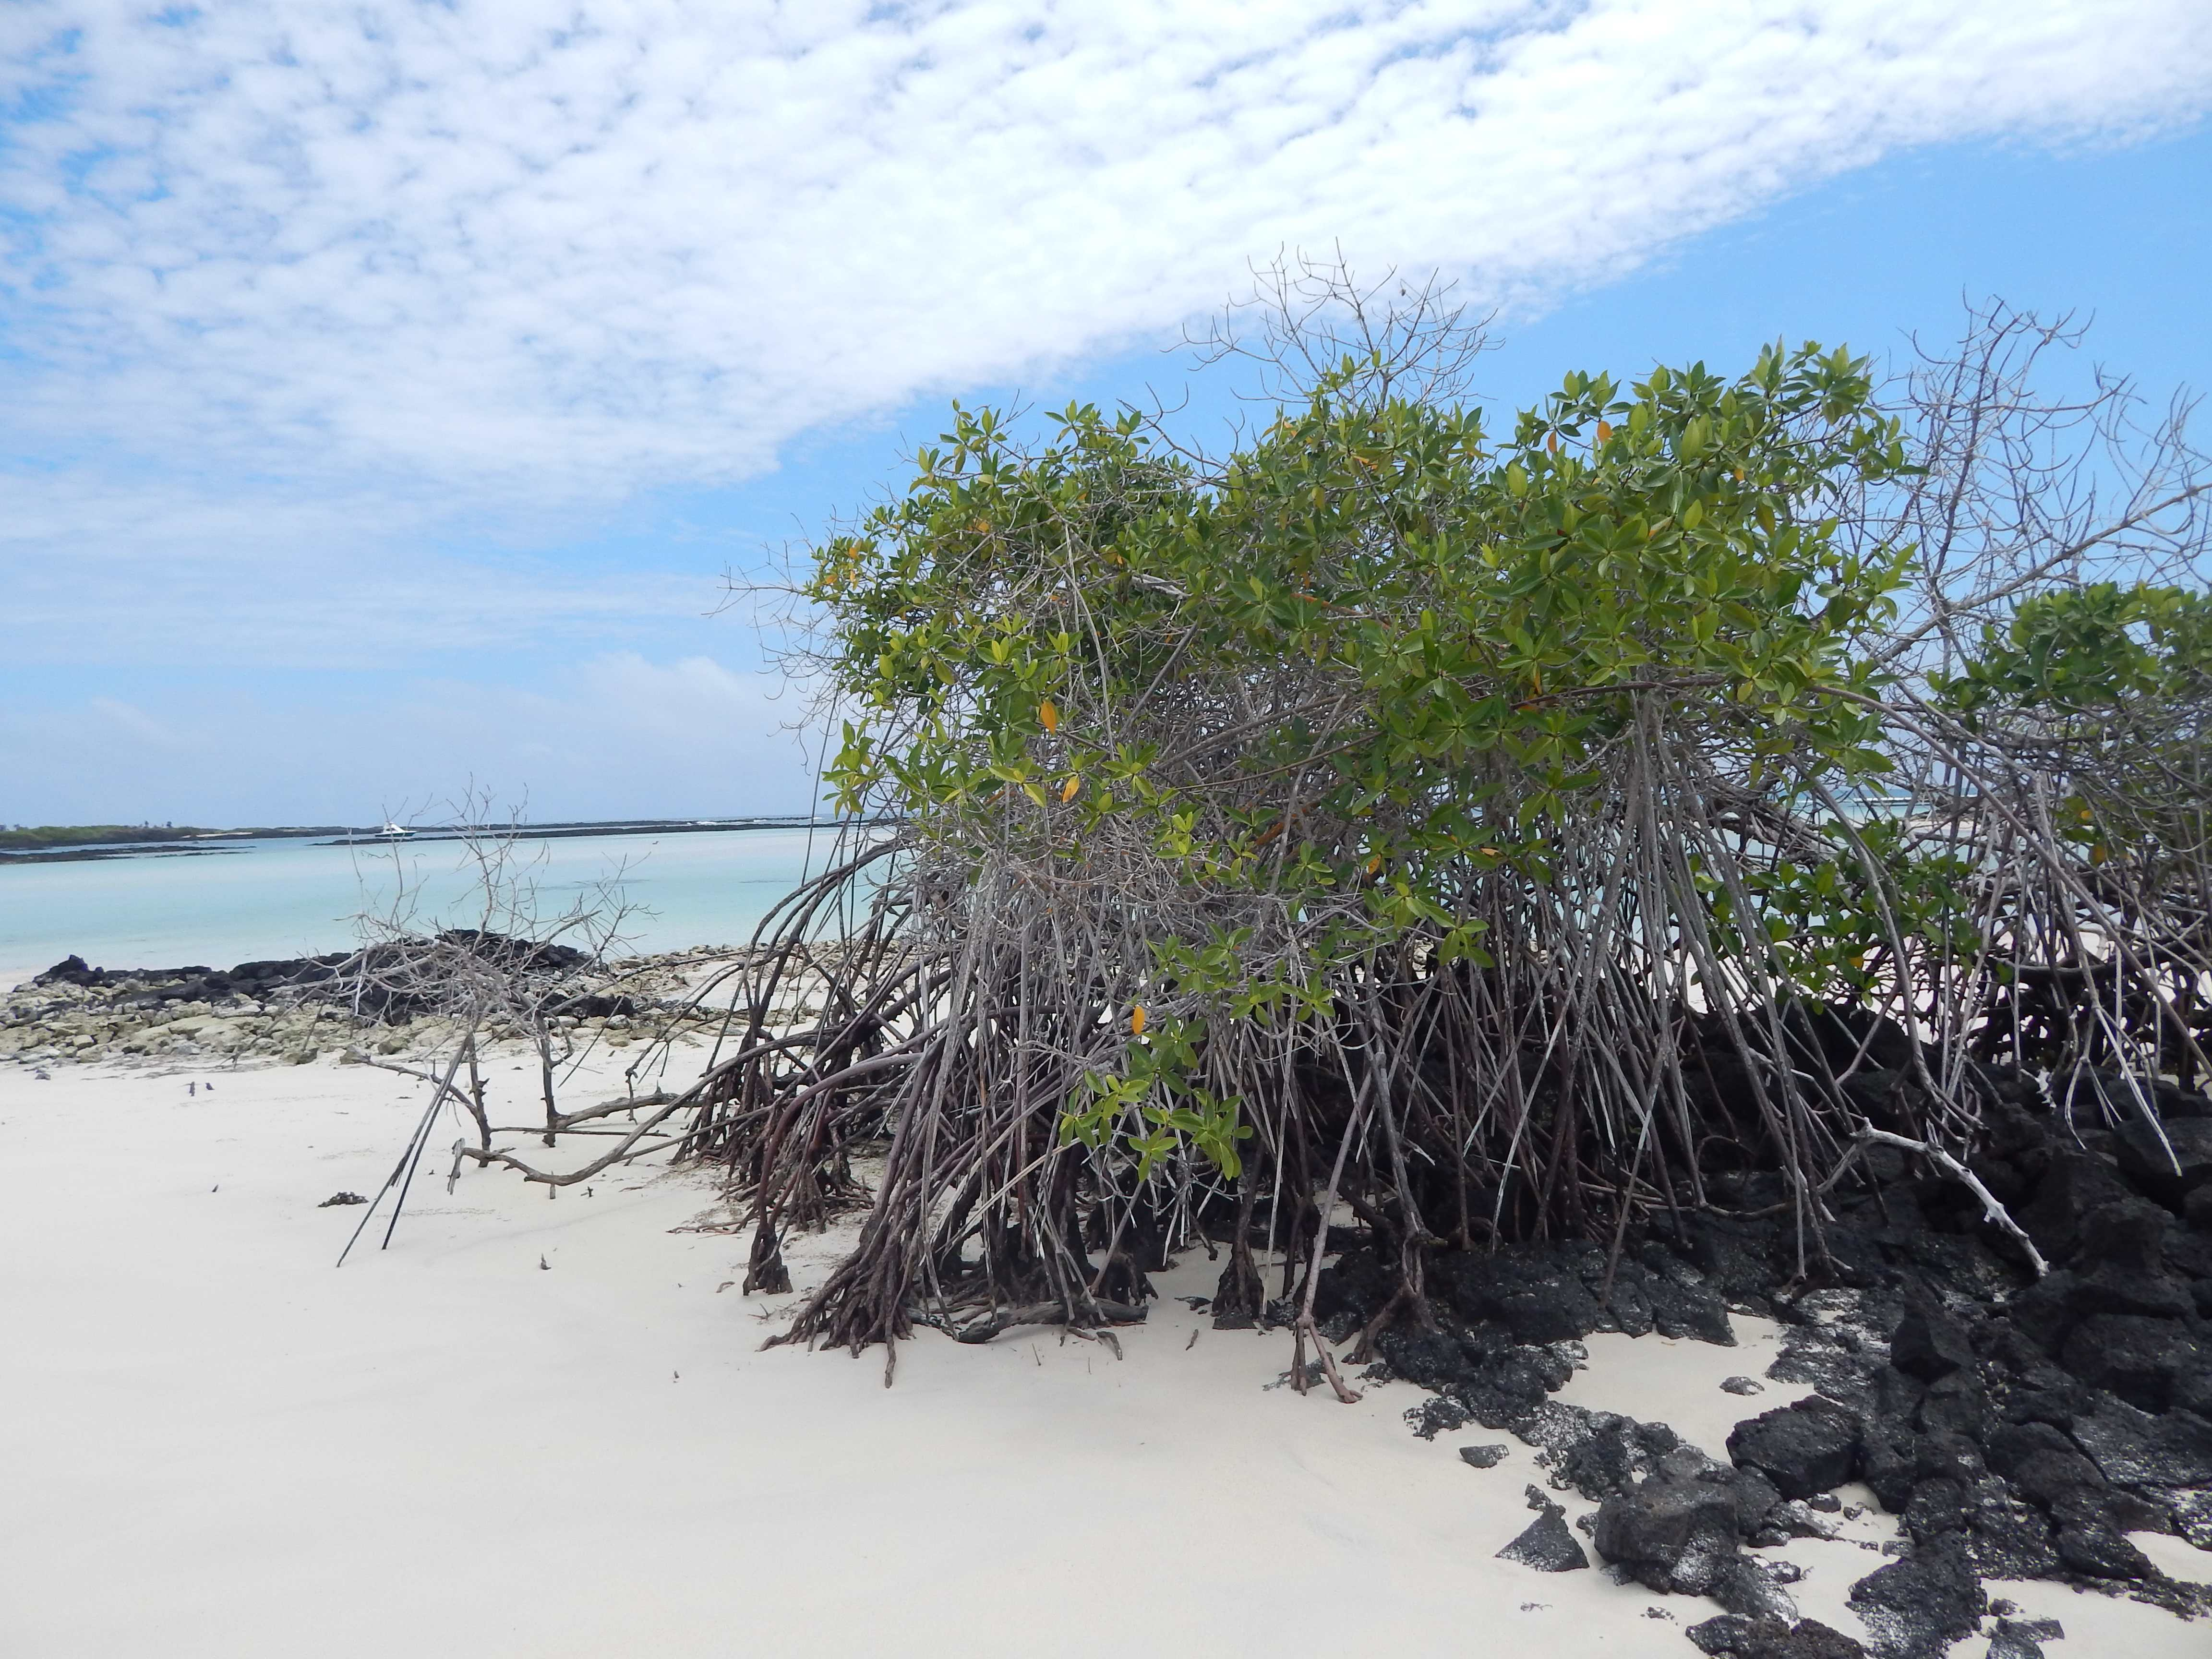 Isla Santa Fé - Îles Galápagos